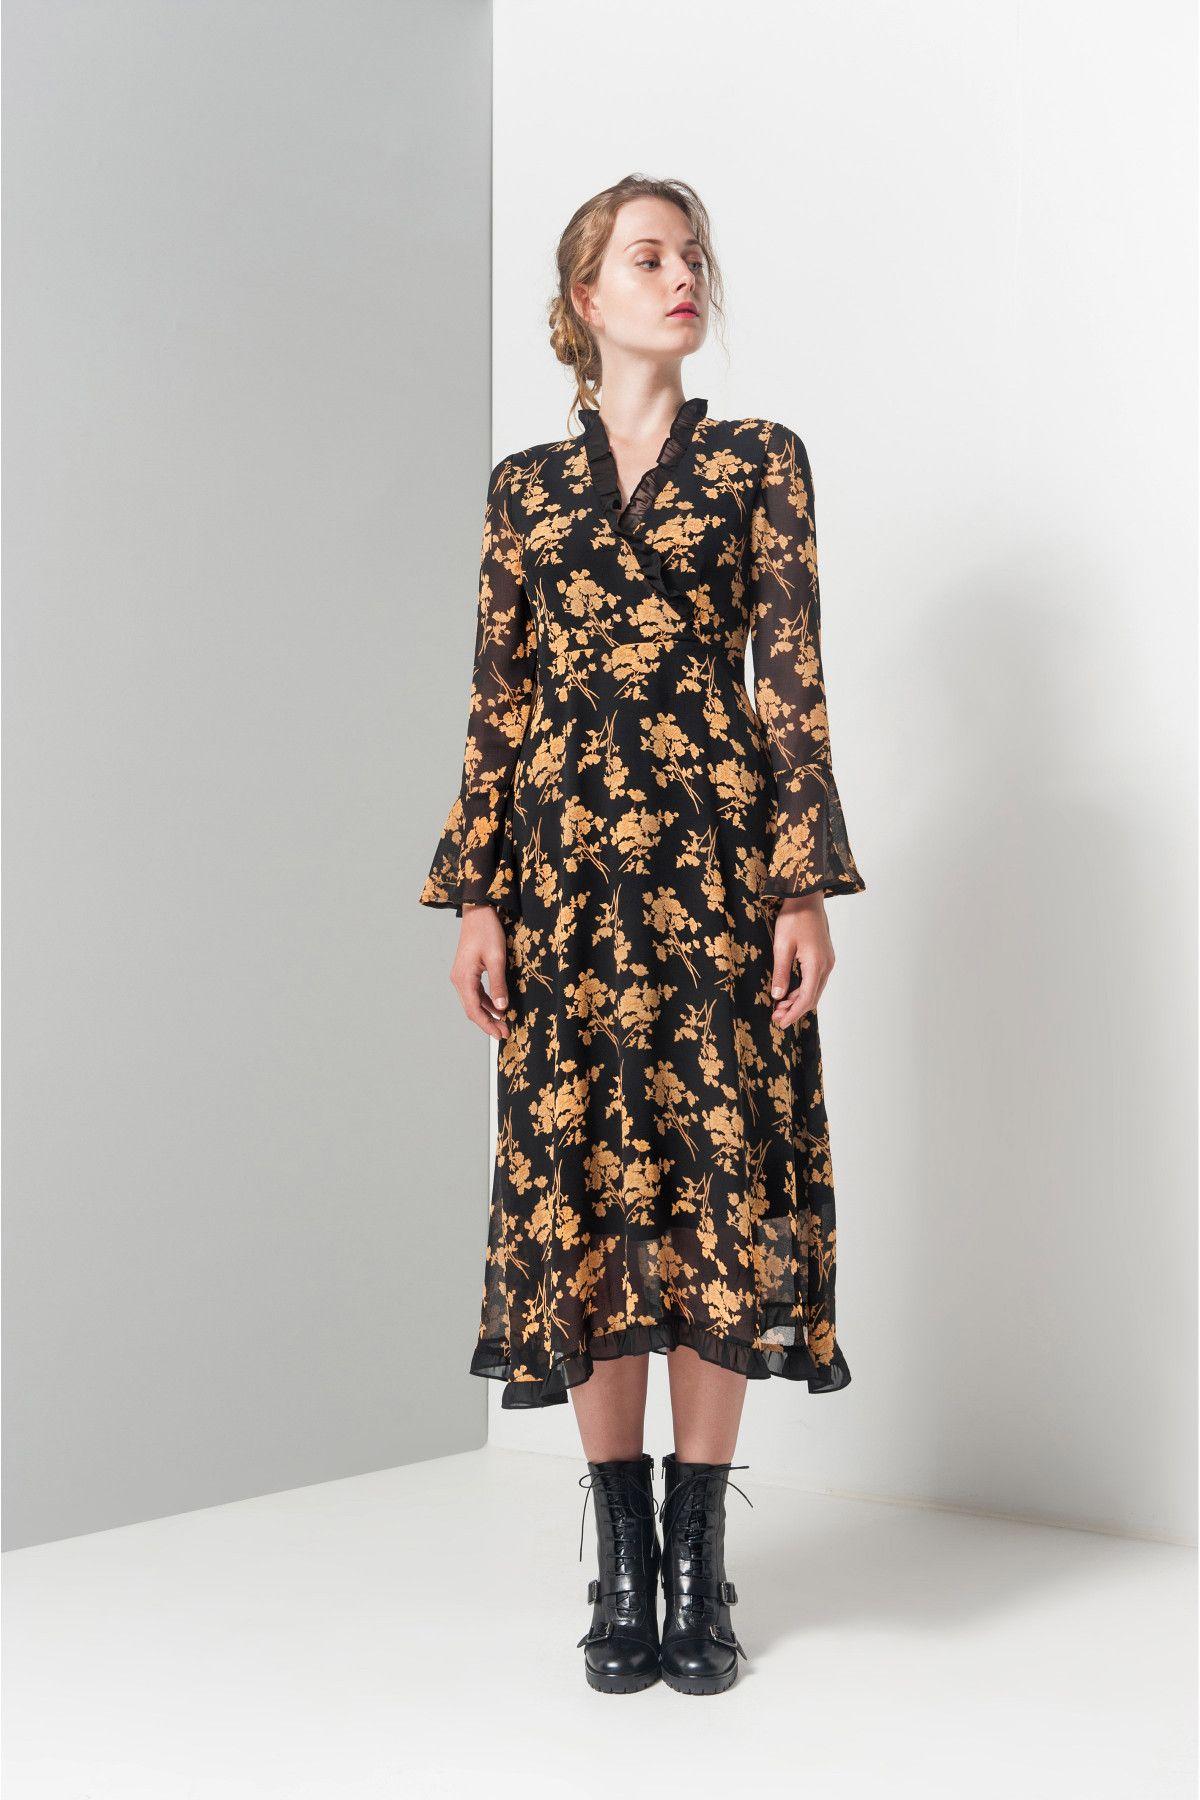 26ea50d48b4e Φορεμα κρουαζε midi